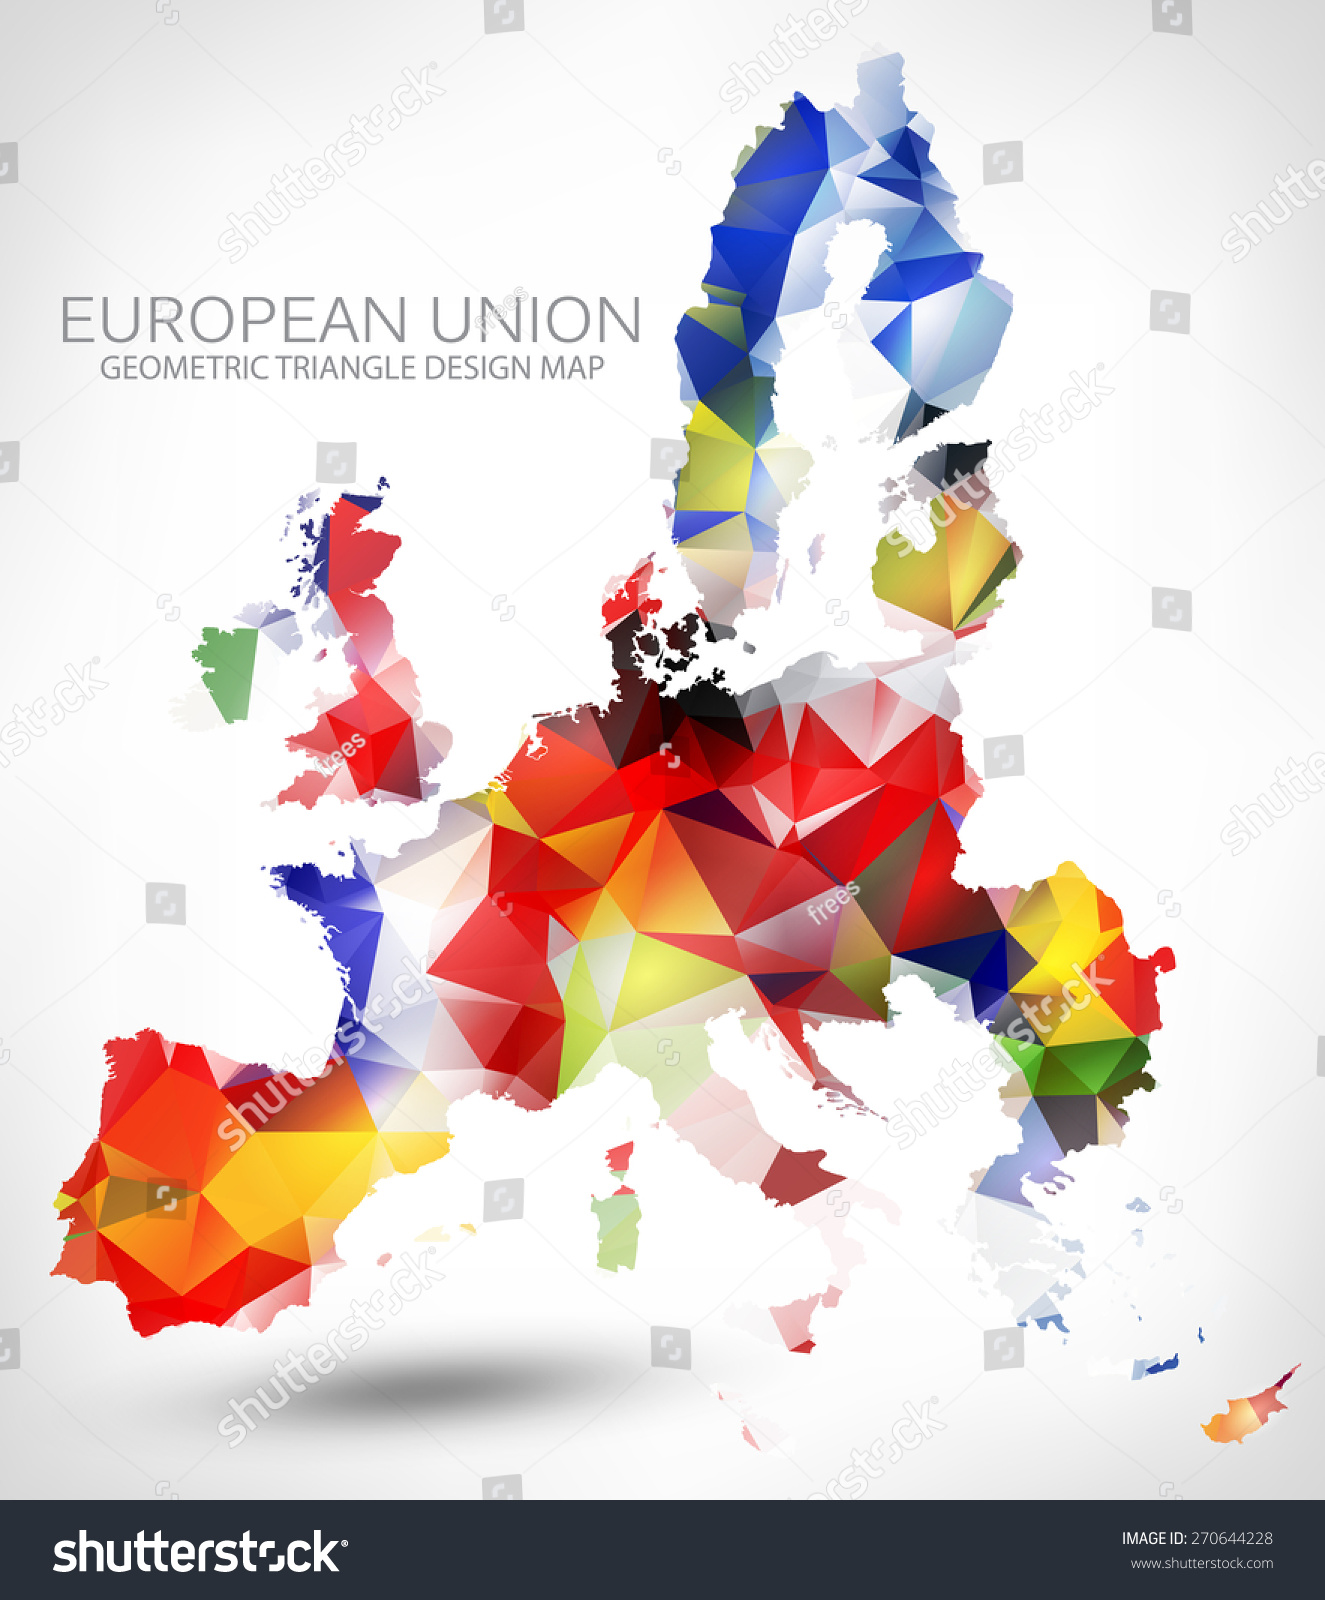 Geometric triangle design map european union stock vector for European design